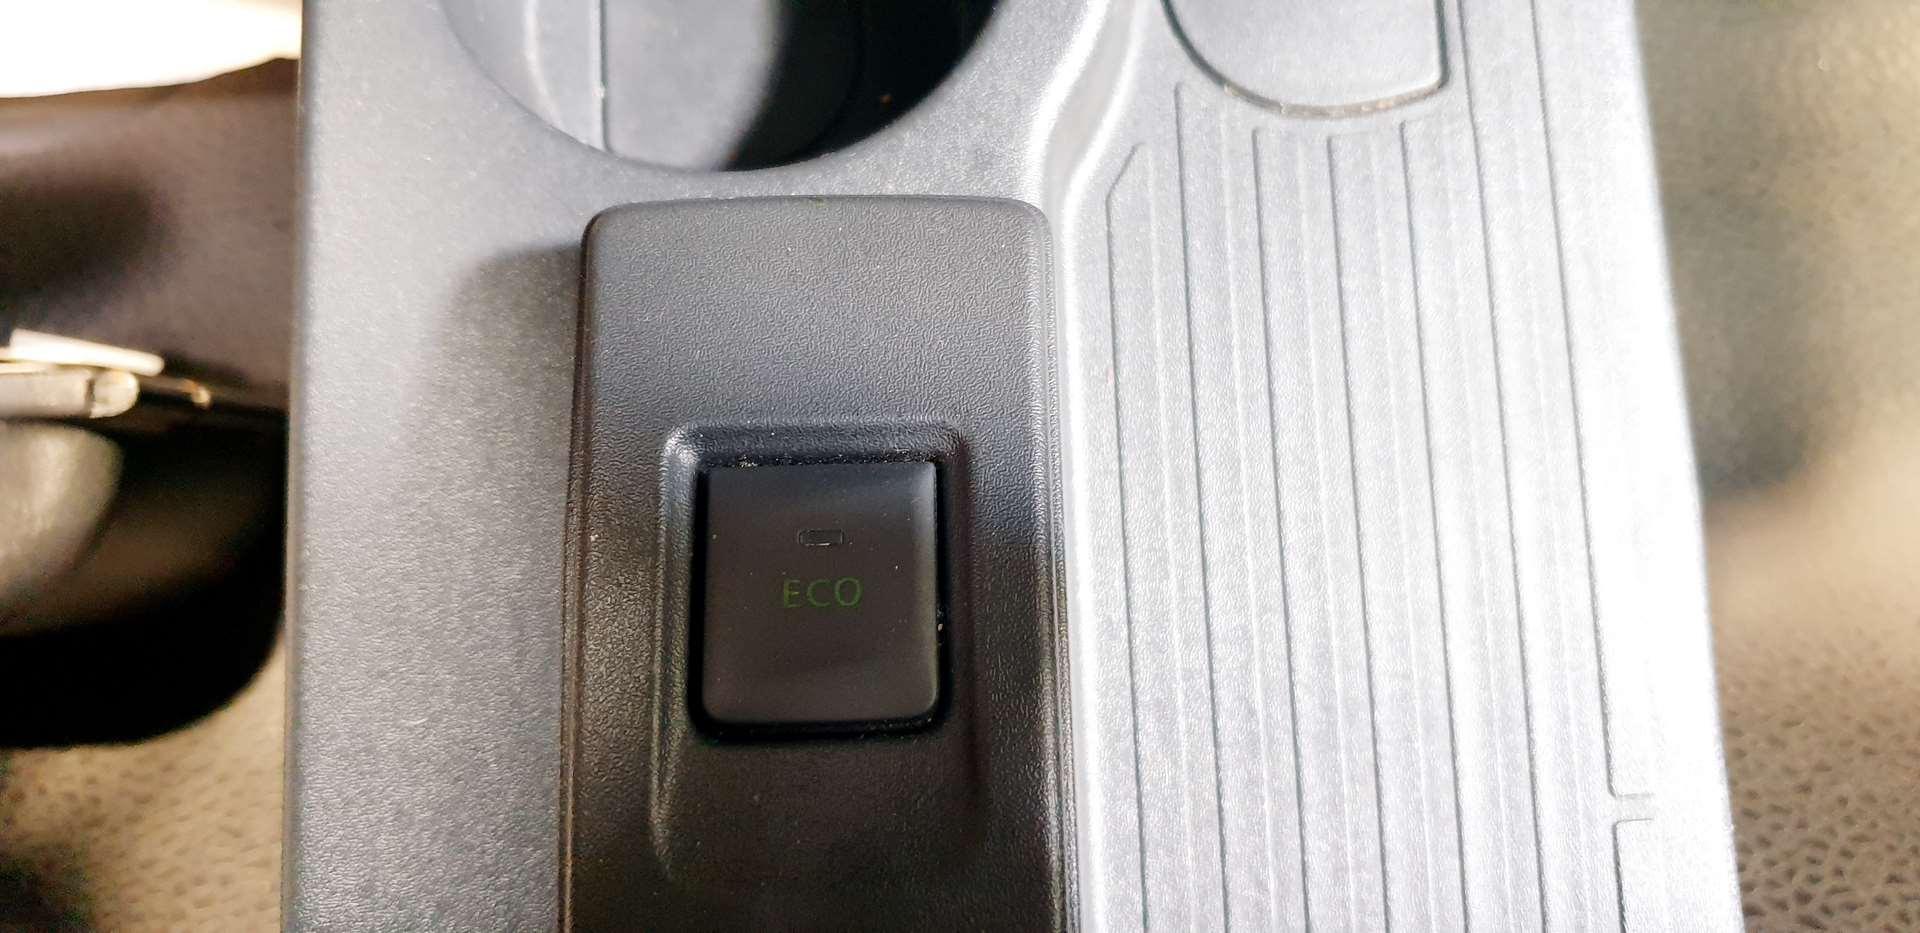 Miniature RENAULT KANGOO EXPRESS 1.5 DCI 90 3 PL GRAND CONFORT